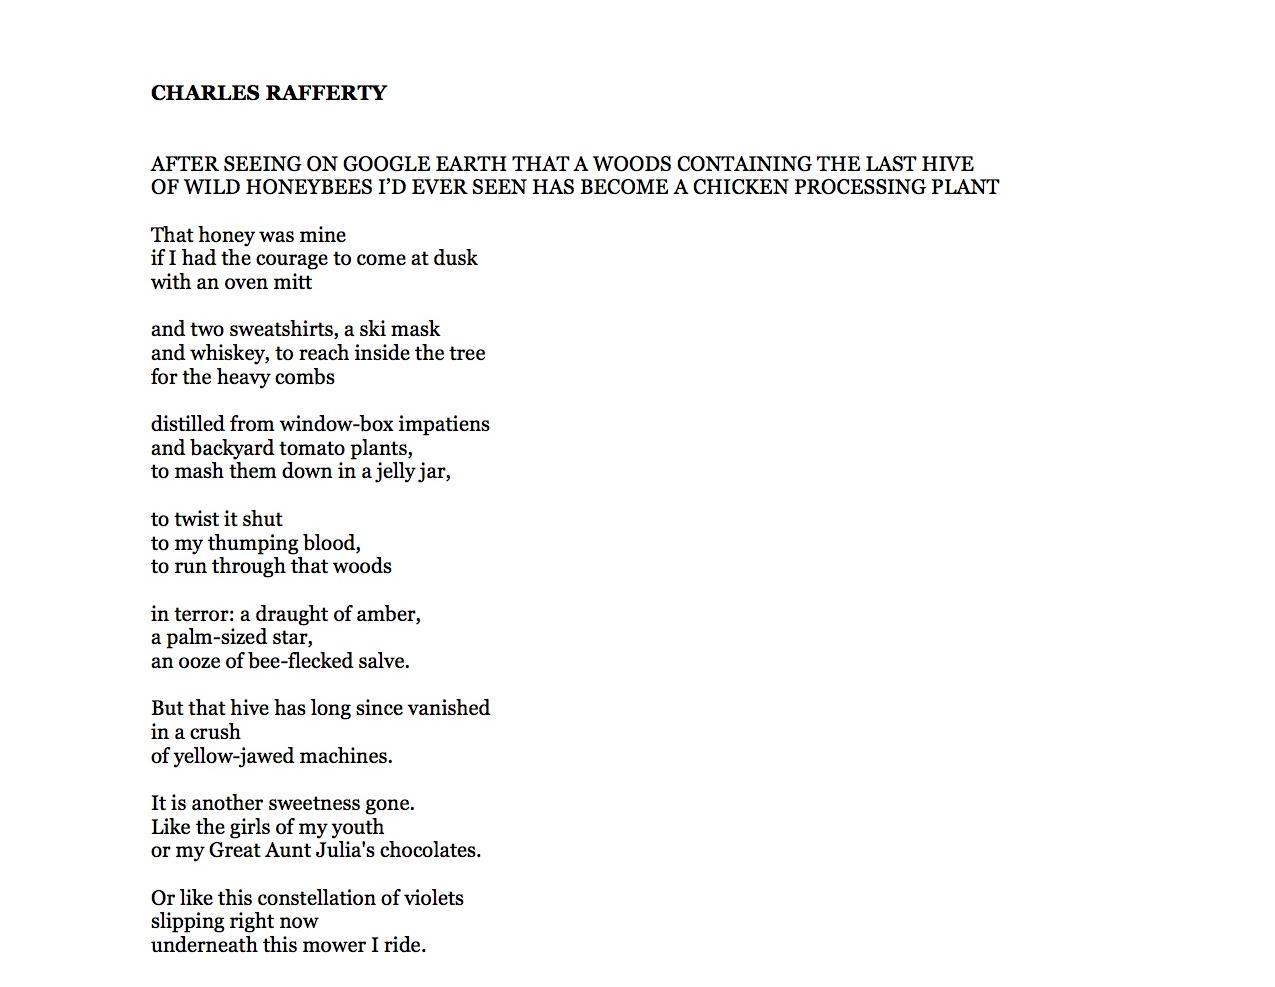 CHARLES RAFFERTY SRR Poem.png